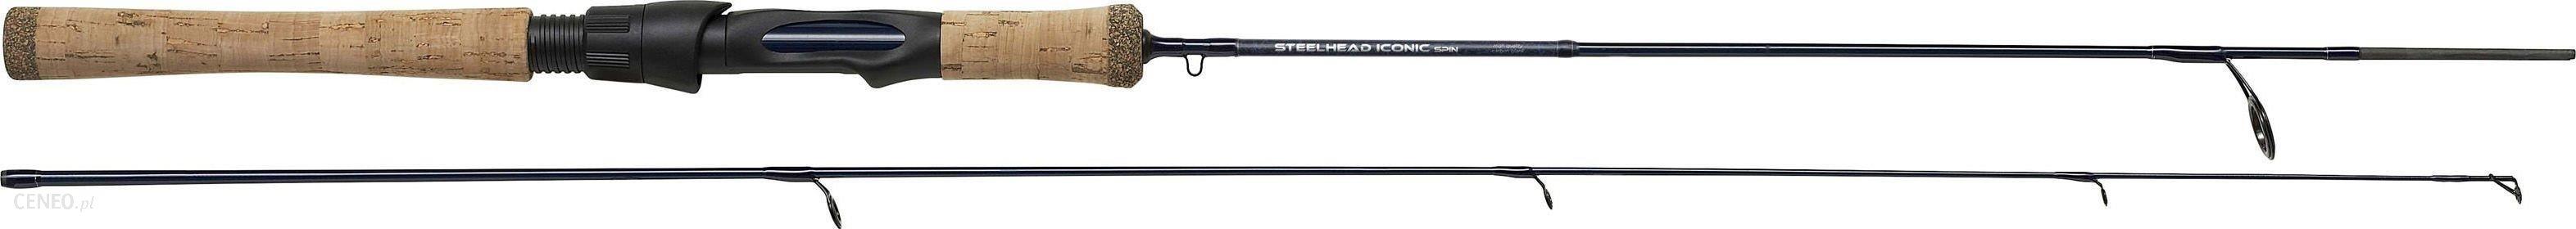 Ron Thompson Steelhead Iconic Spin 8' 240Cm 20-60G 2Cz (61414)